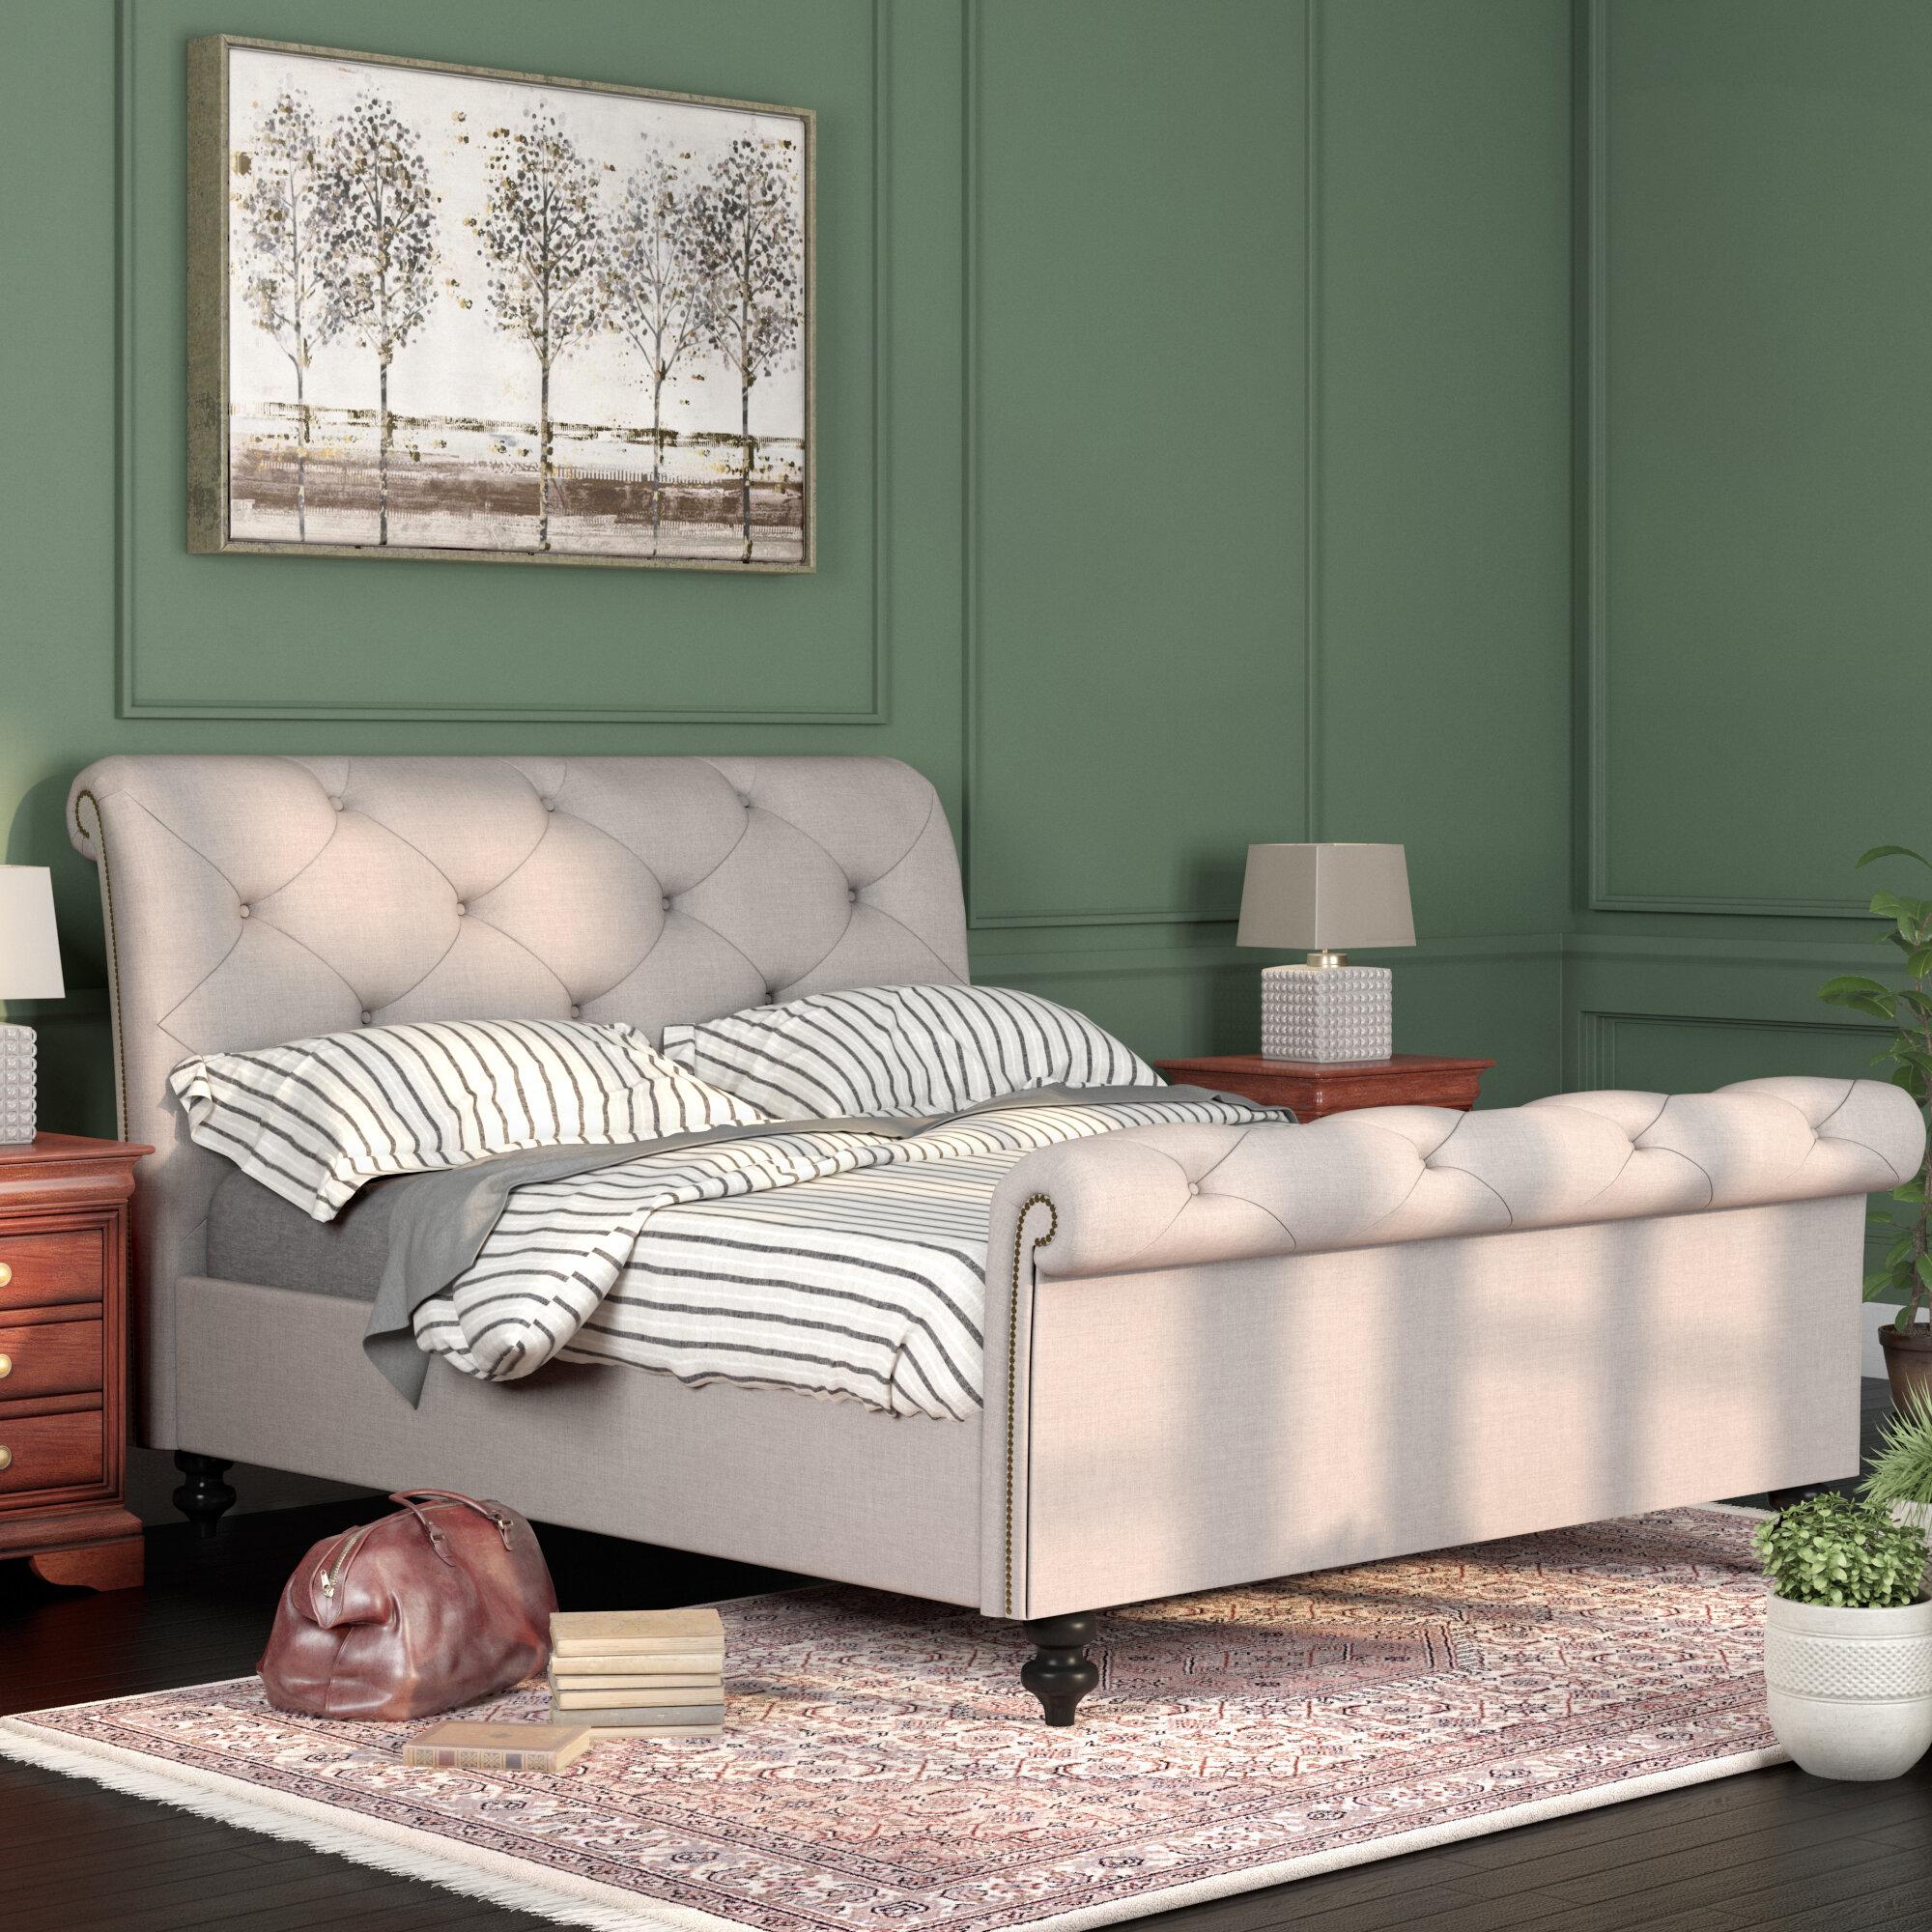 darby furniture home co bed pdx wayfair sleigh upholstered karsten reviews